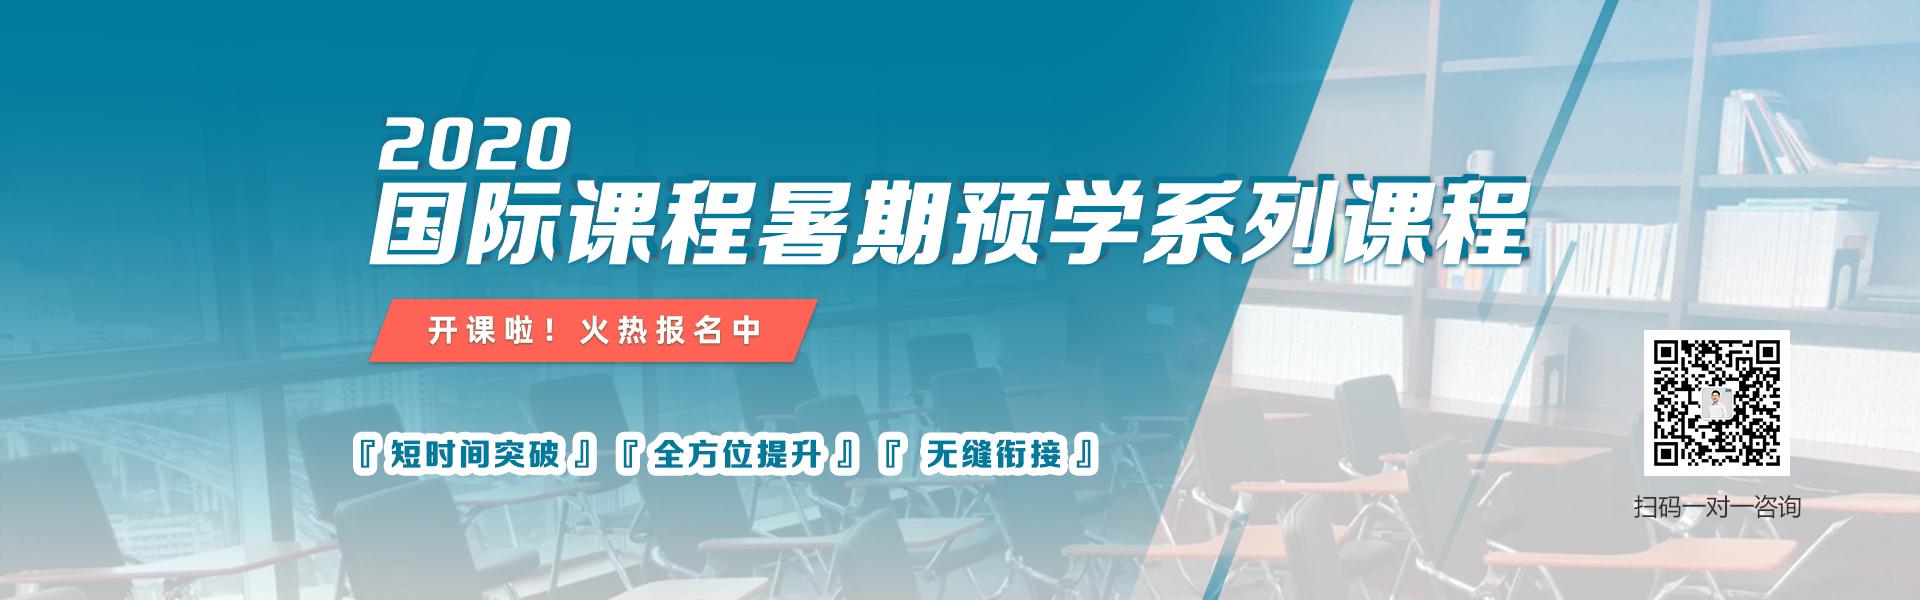 IB/AP/Alevel国际课程暑假预学